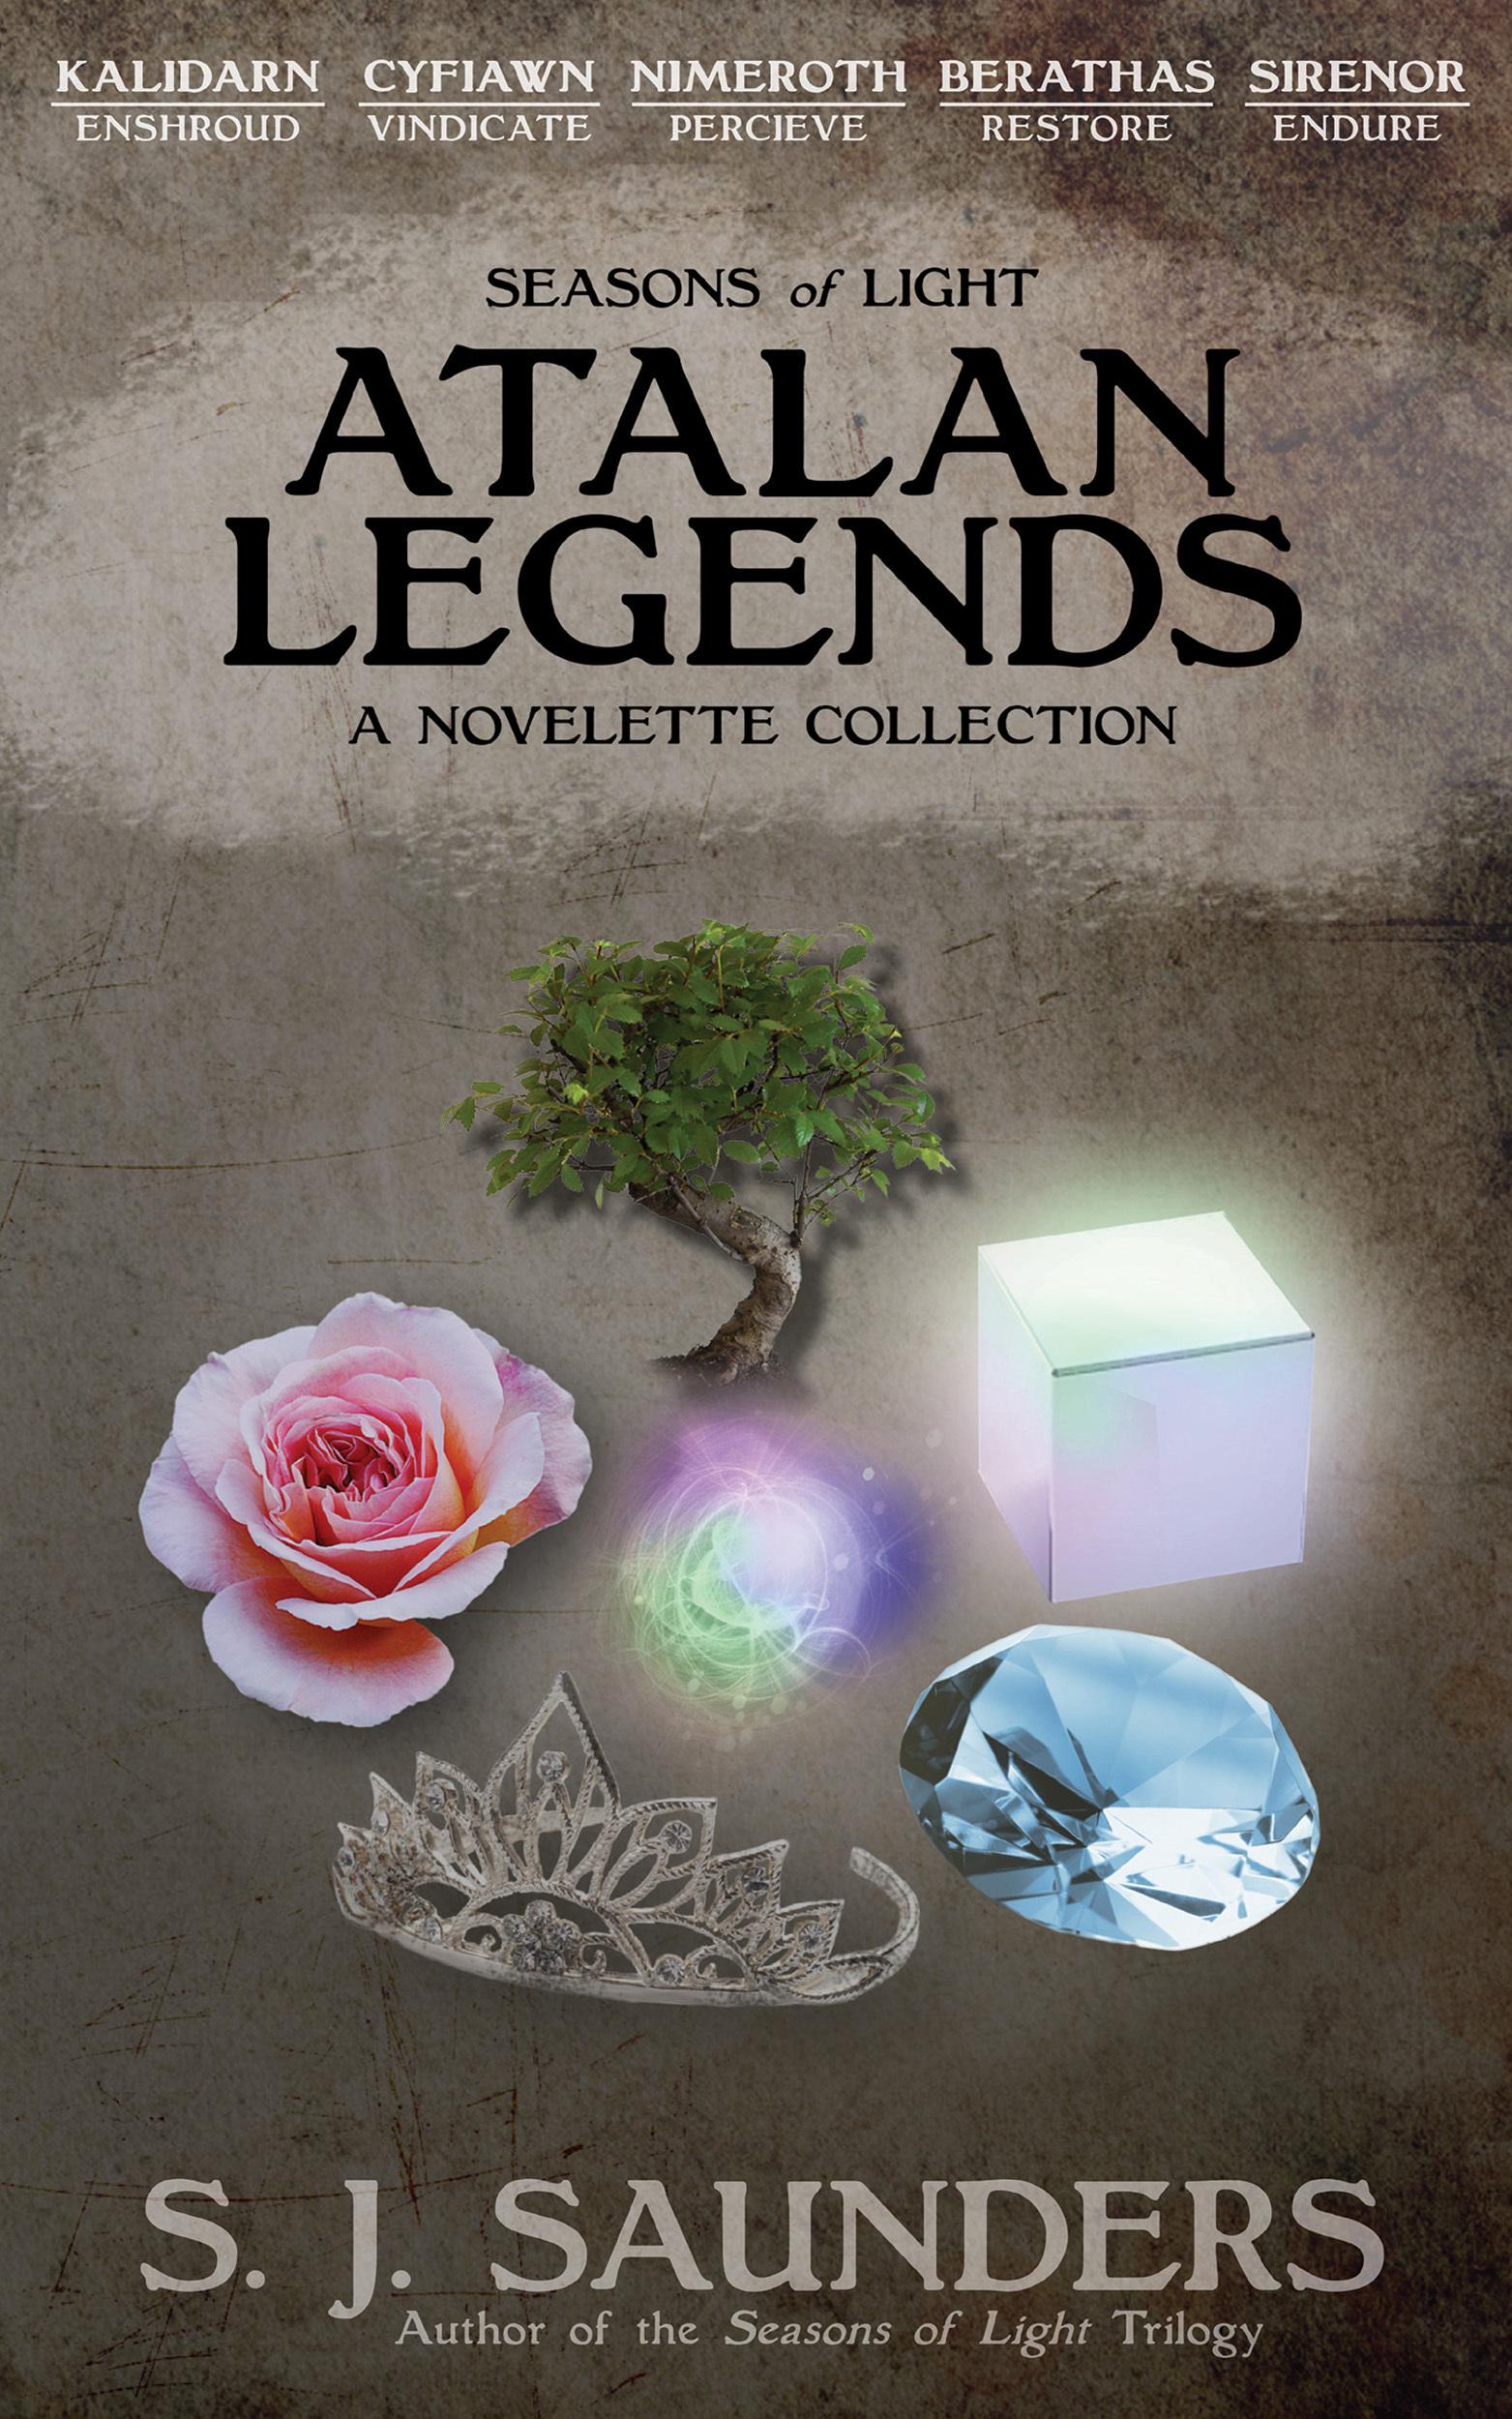 Seasons of Light: Atalan Legends S.J. Saunders